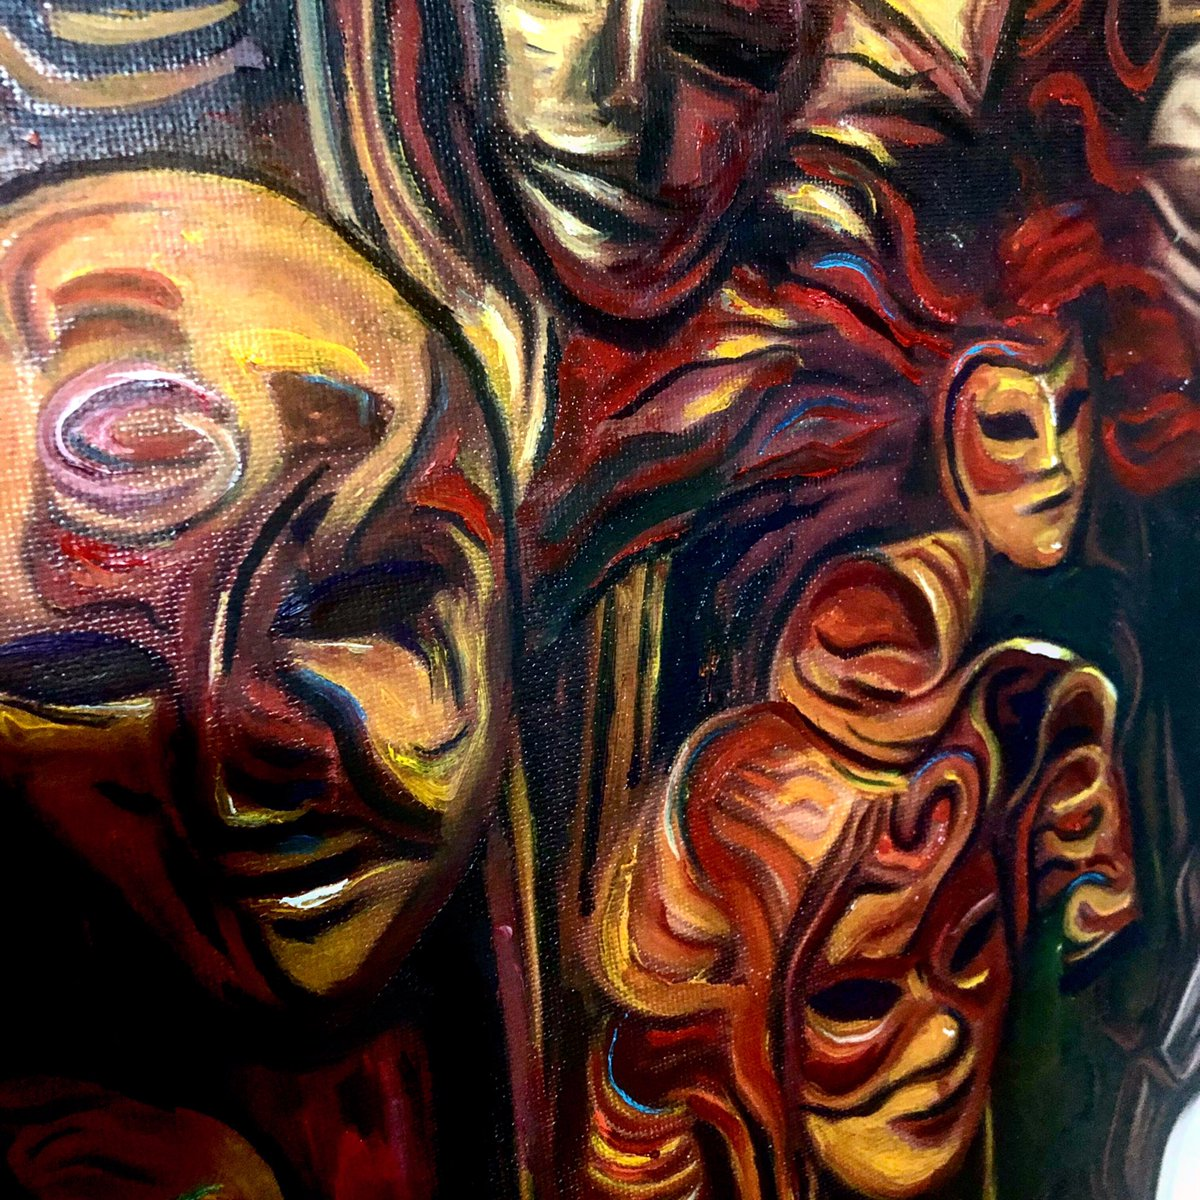 Humantropía ... detalles II... #perrisco #inspiration #oilpainting #oiloncanvas #everythingstartedwithanapple #arte #streetart #contemporaryart #modernart #figurativeart #artist #artgallery #pintura #oldhollandcolours #payaso #humantropia #design #designinspiration